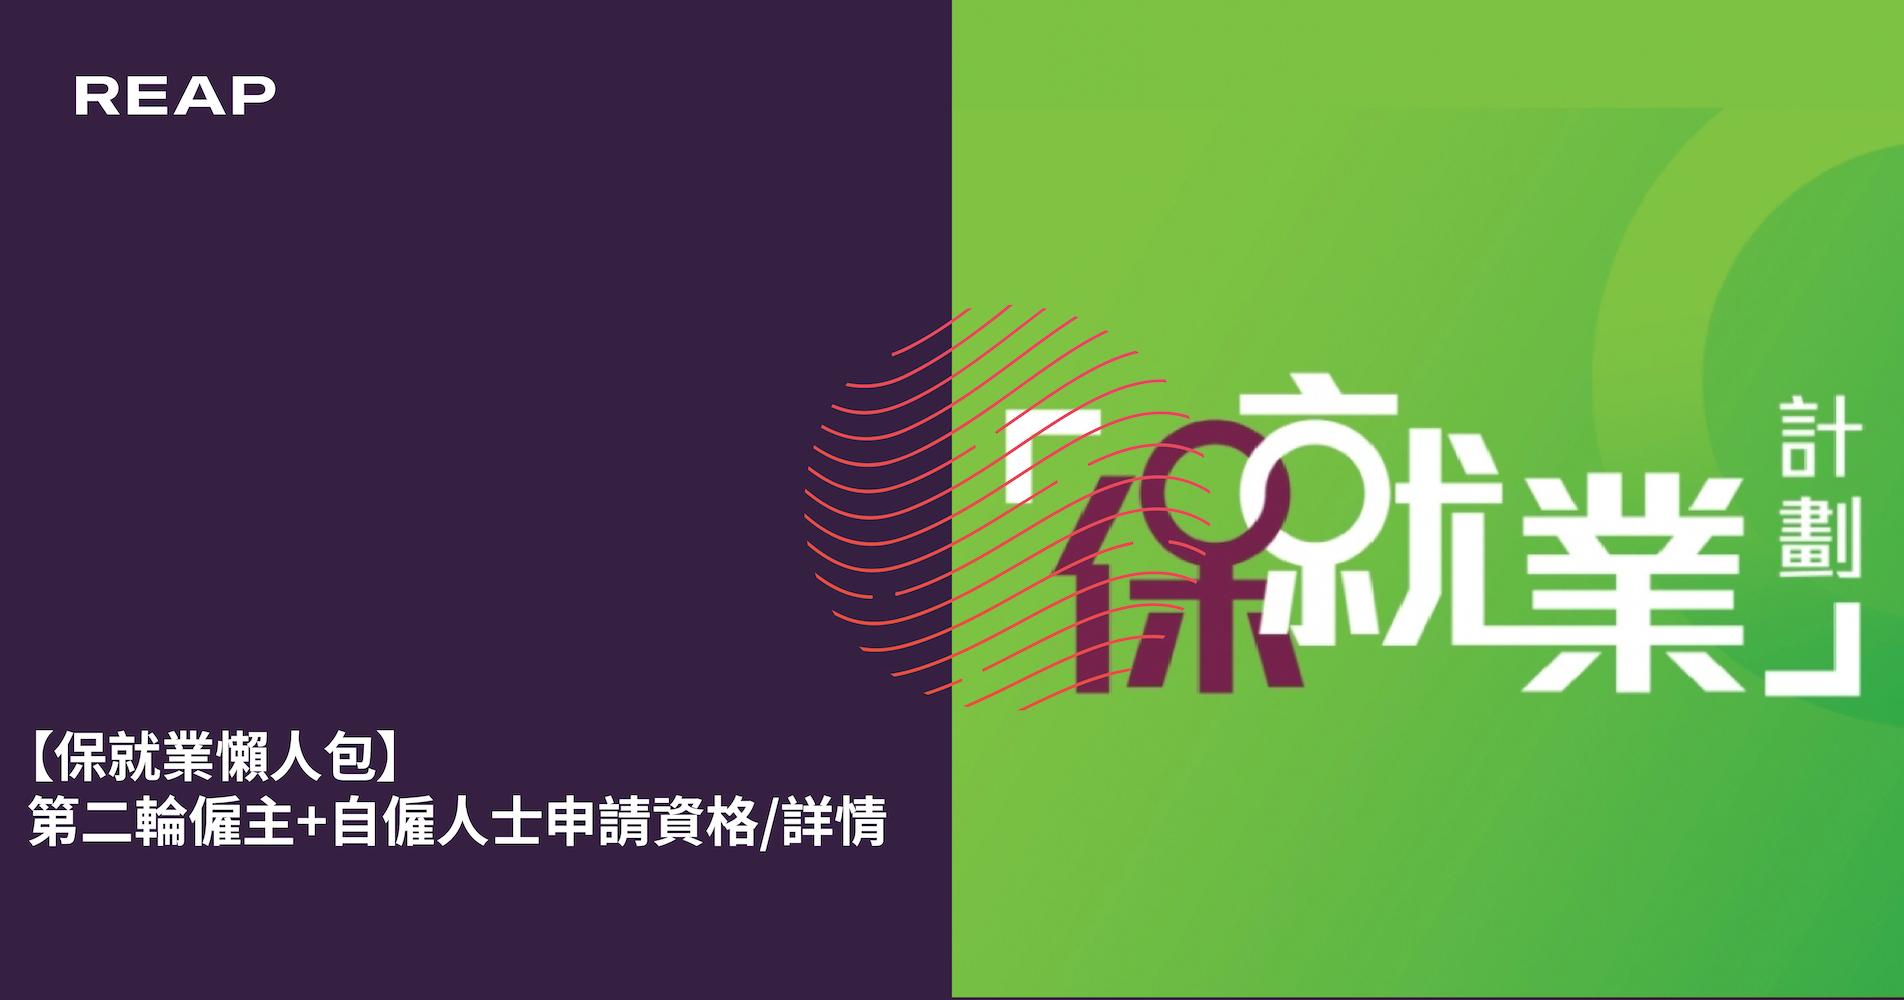 Cover Image for 【保就業懶人包】第二輪僱主+自僱人士申請資格/詳情